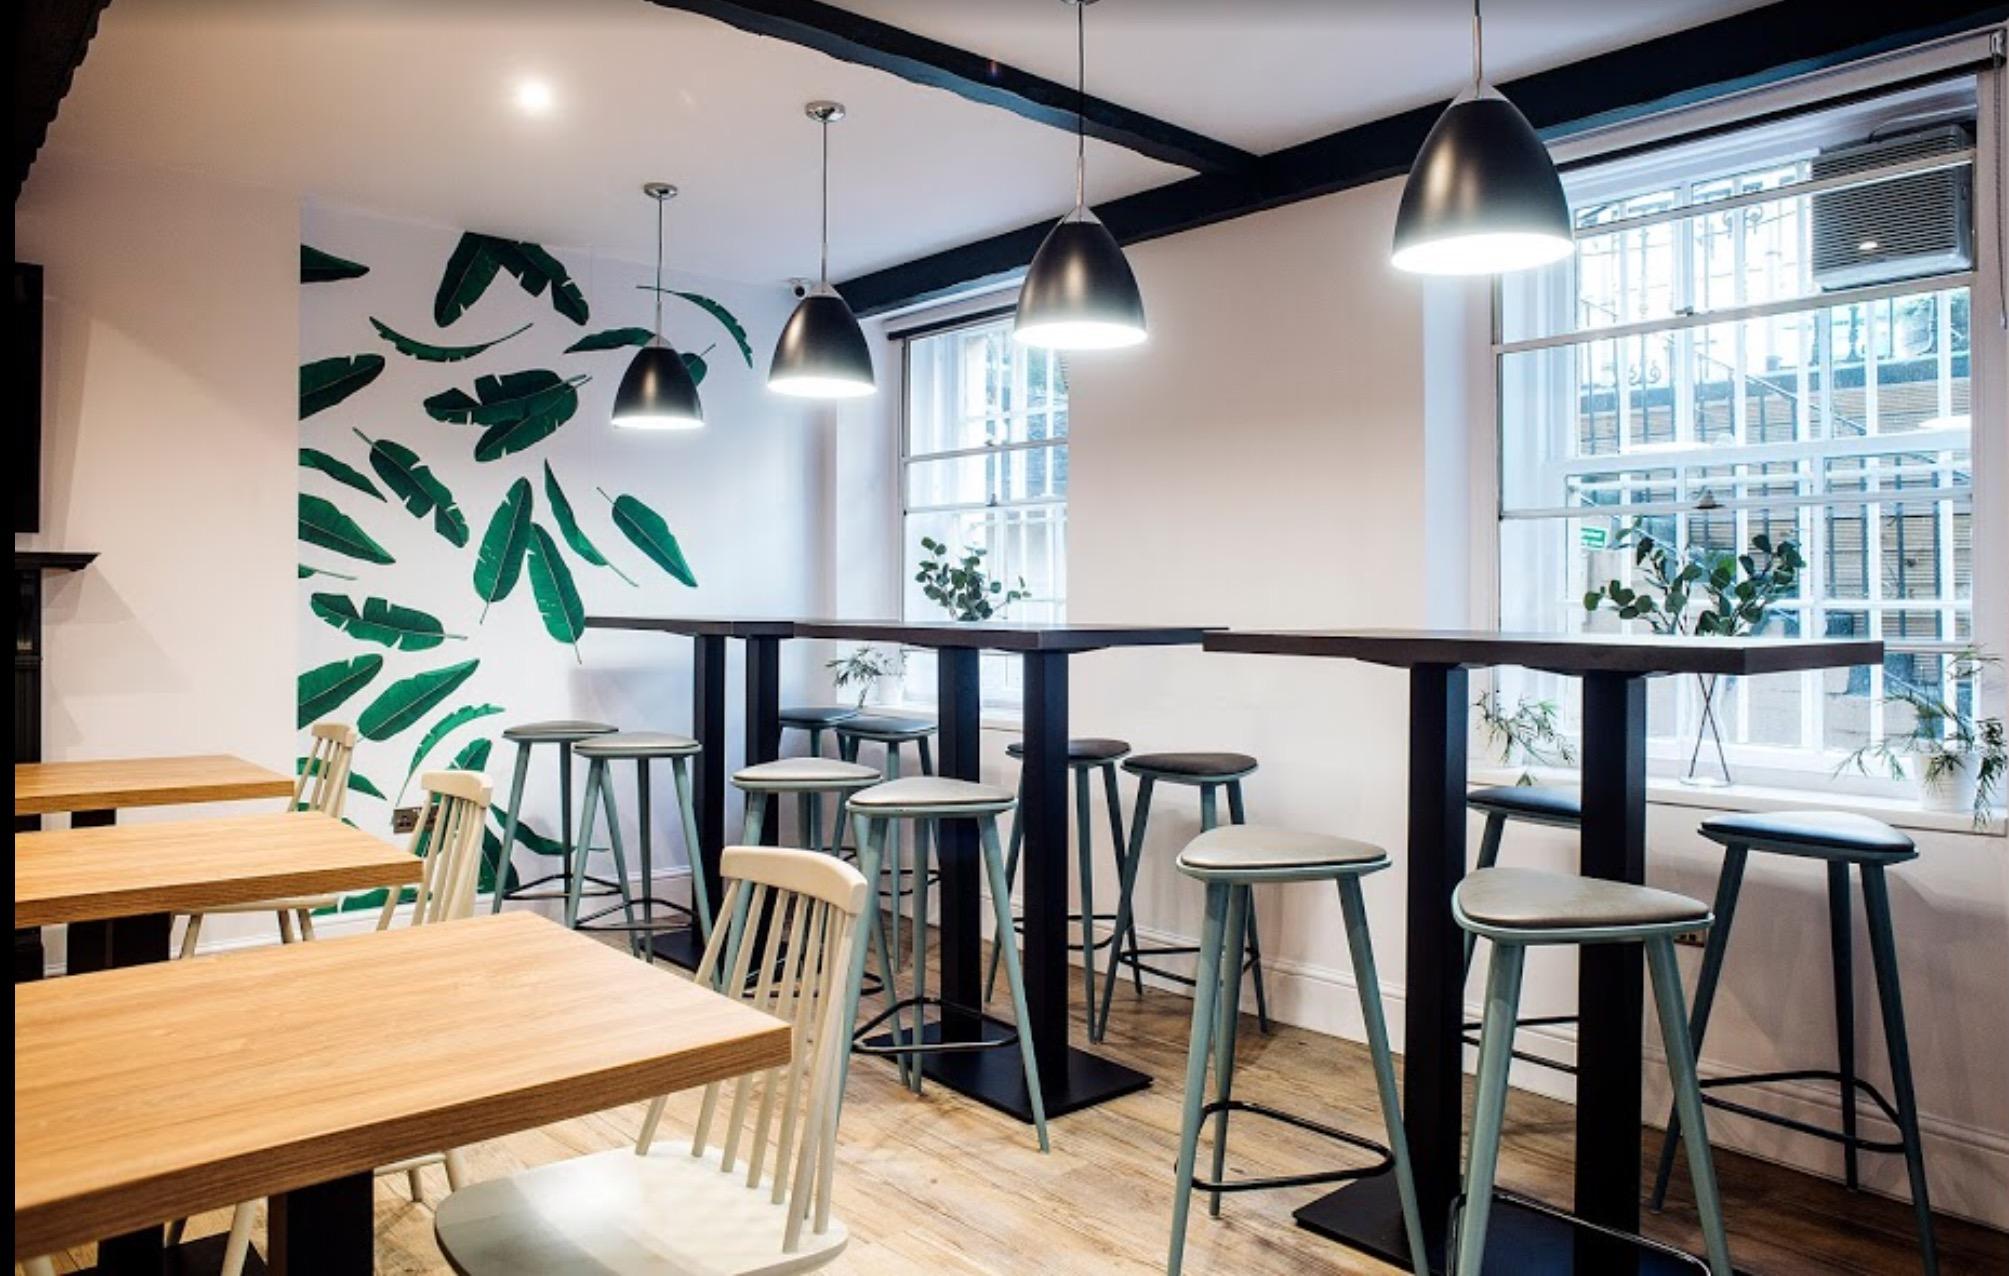 restaurant-chairs-soul-food-kitchen.jpg